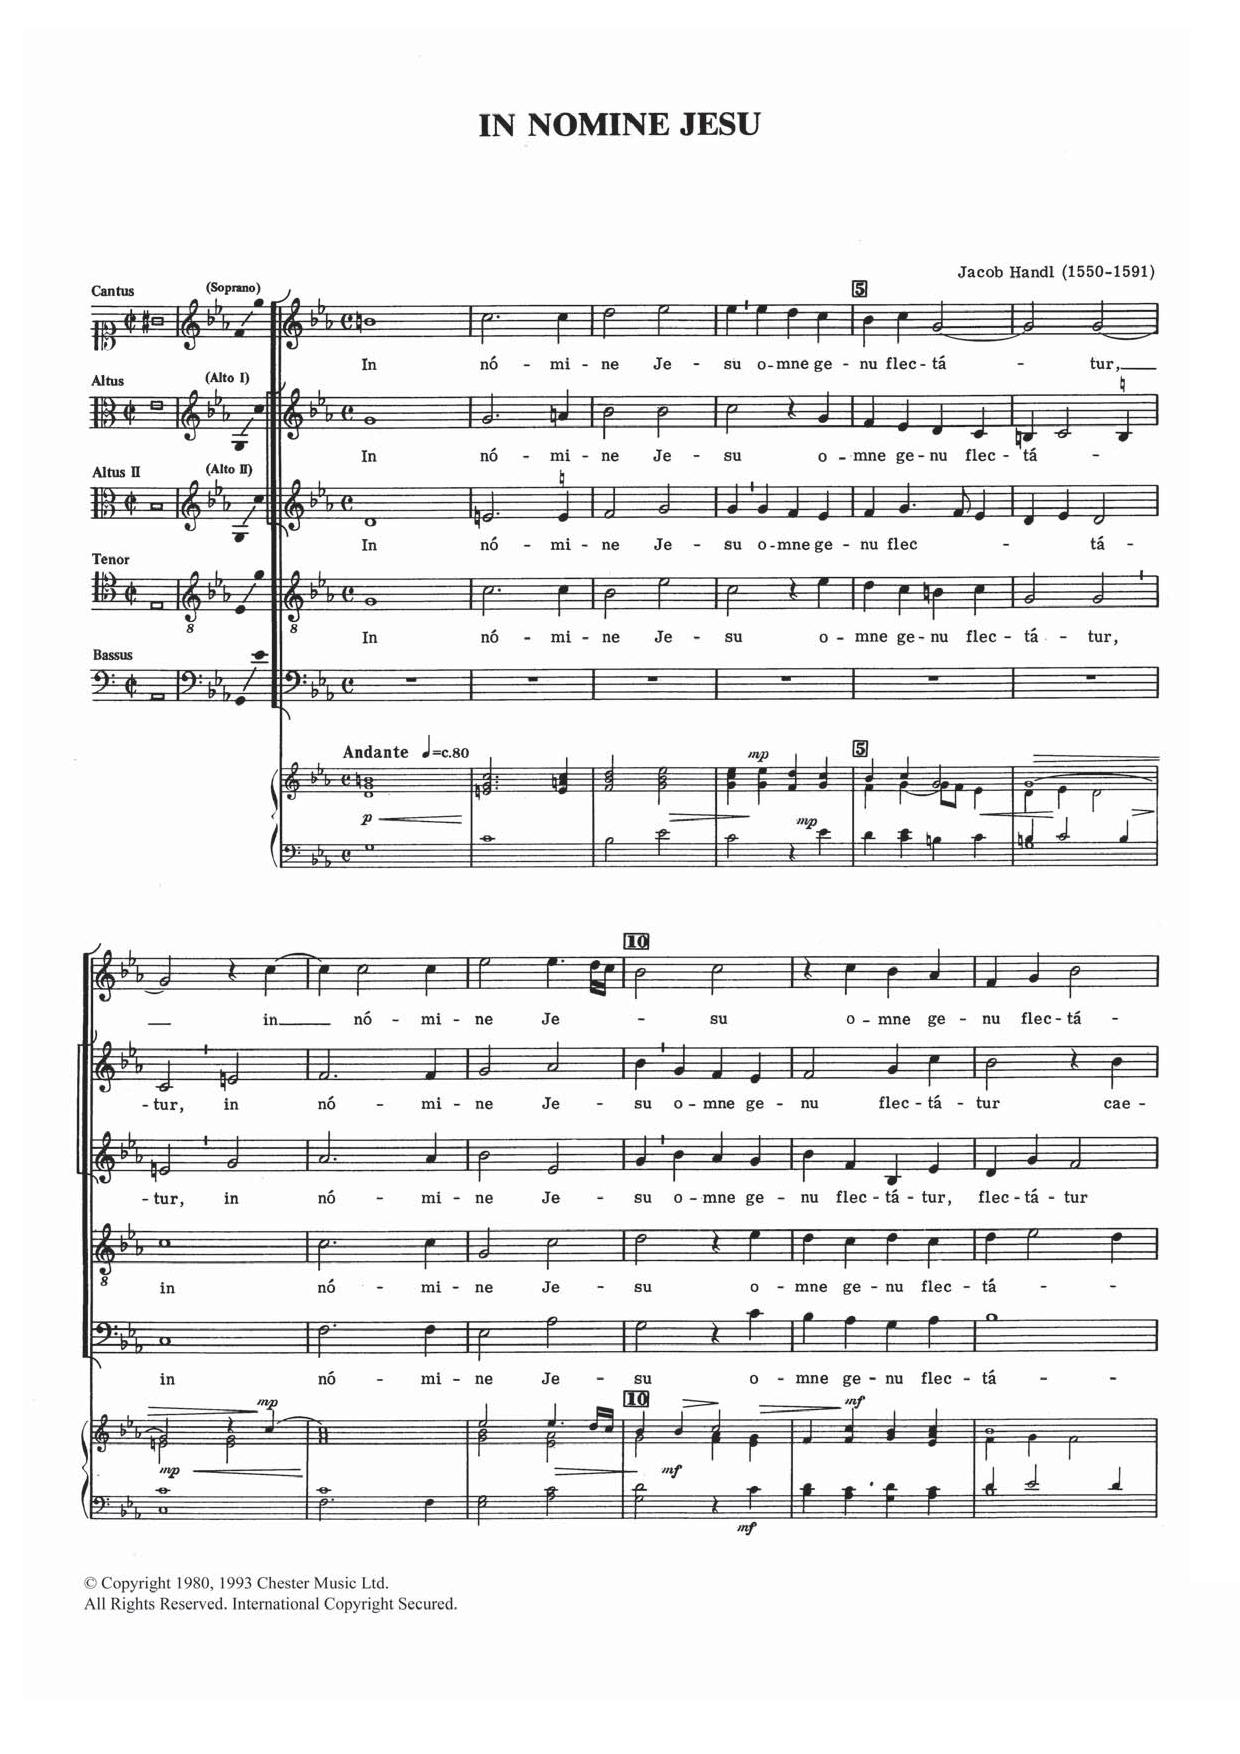 In Nomine Jesu Sheet Music